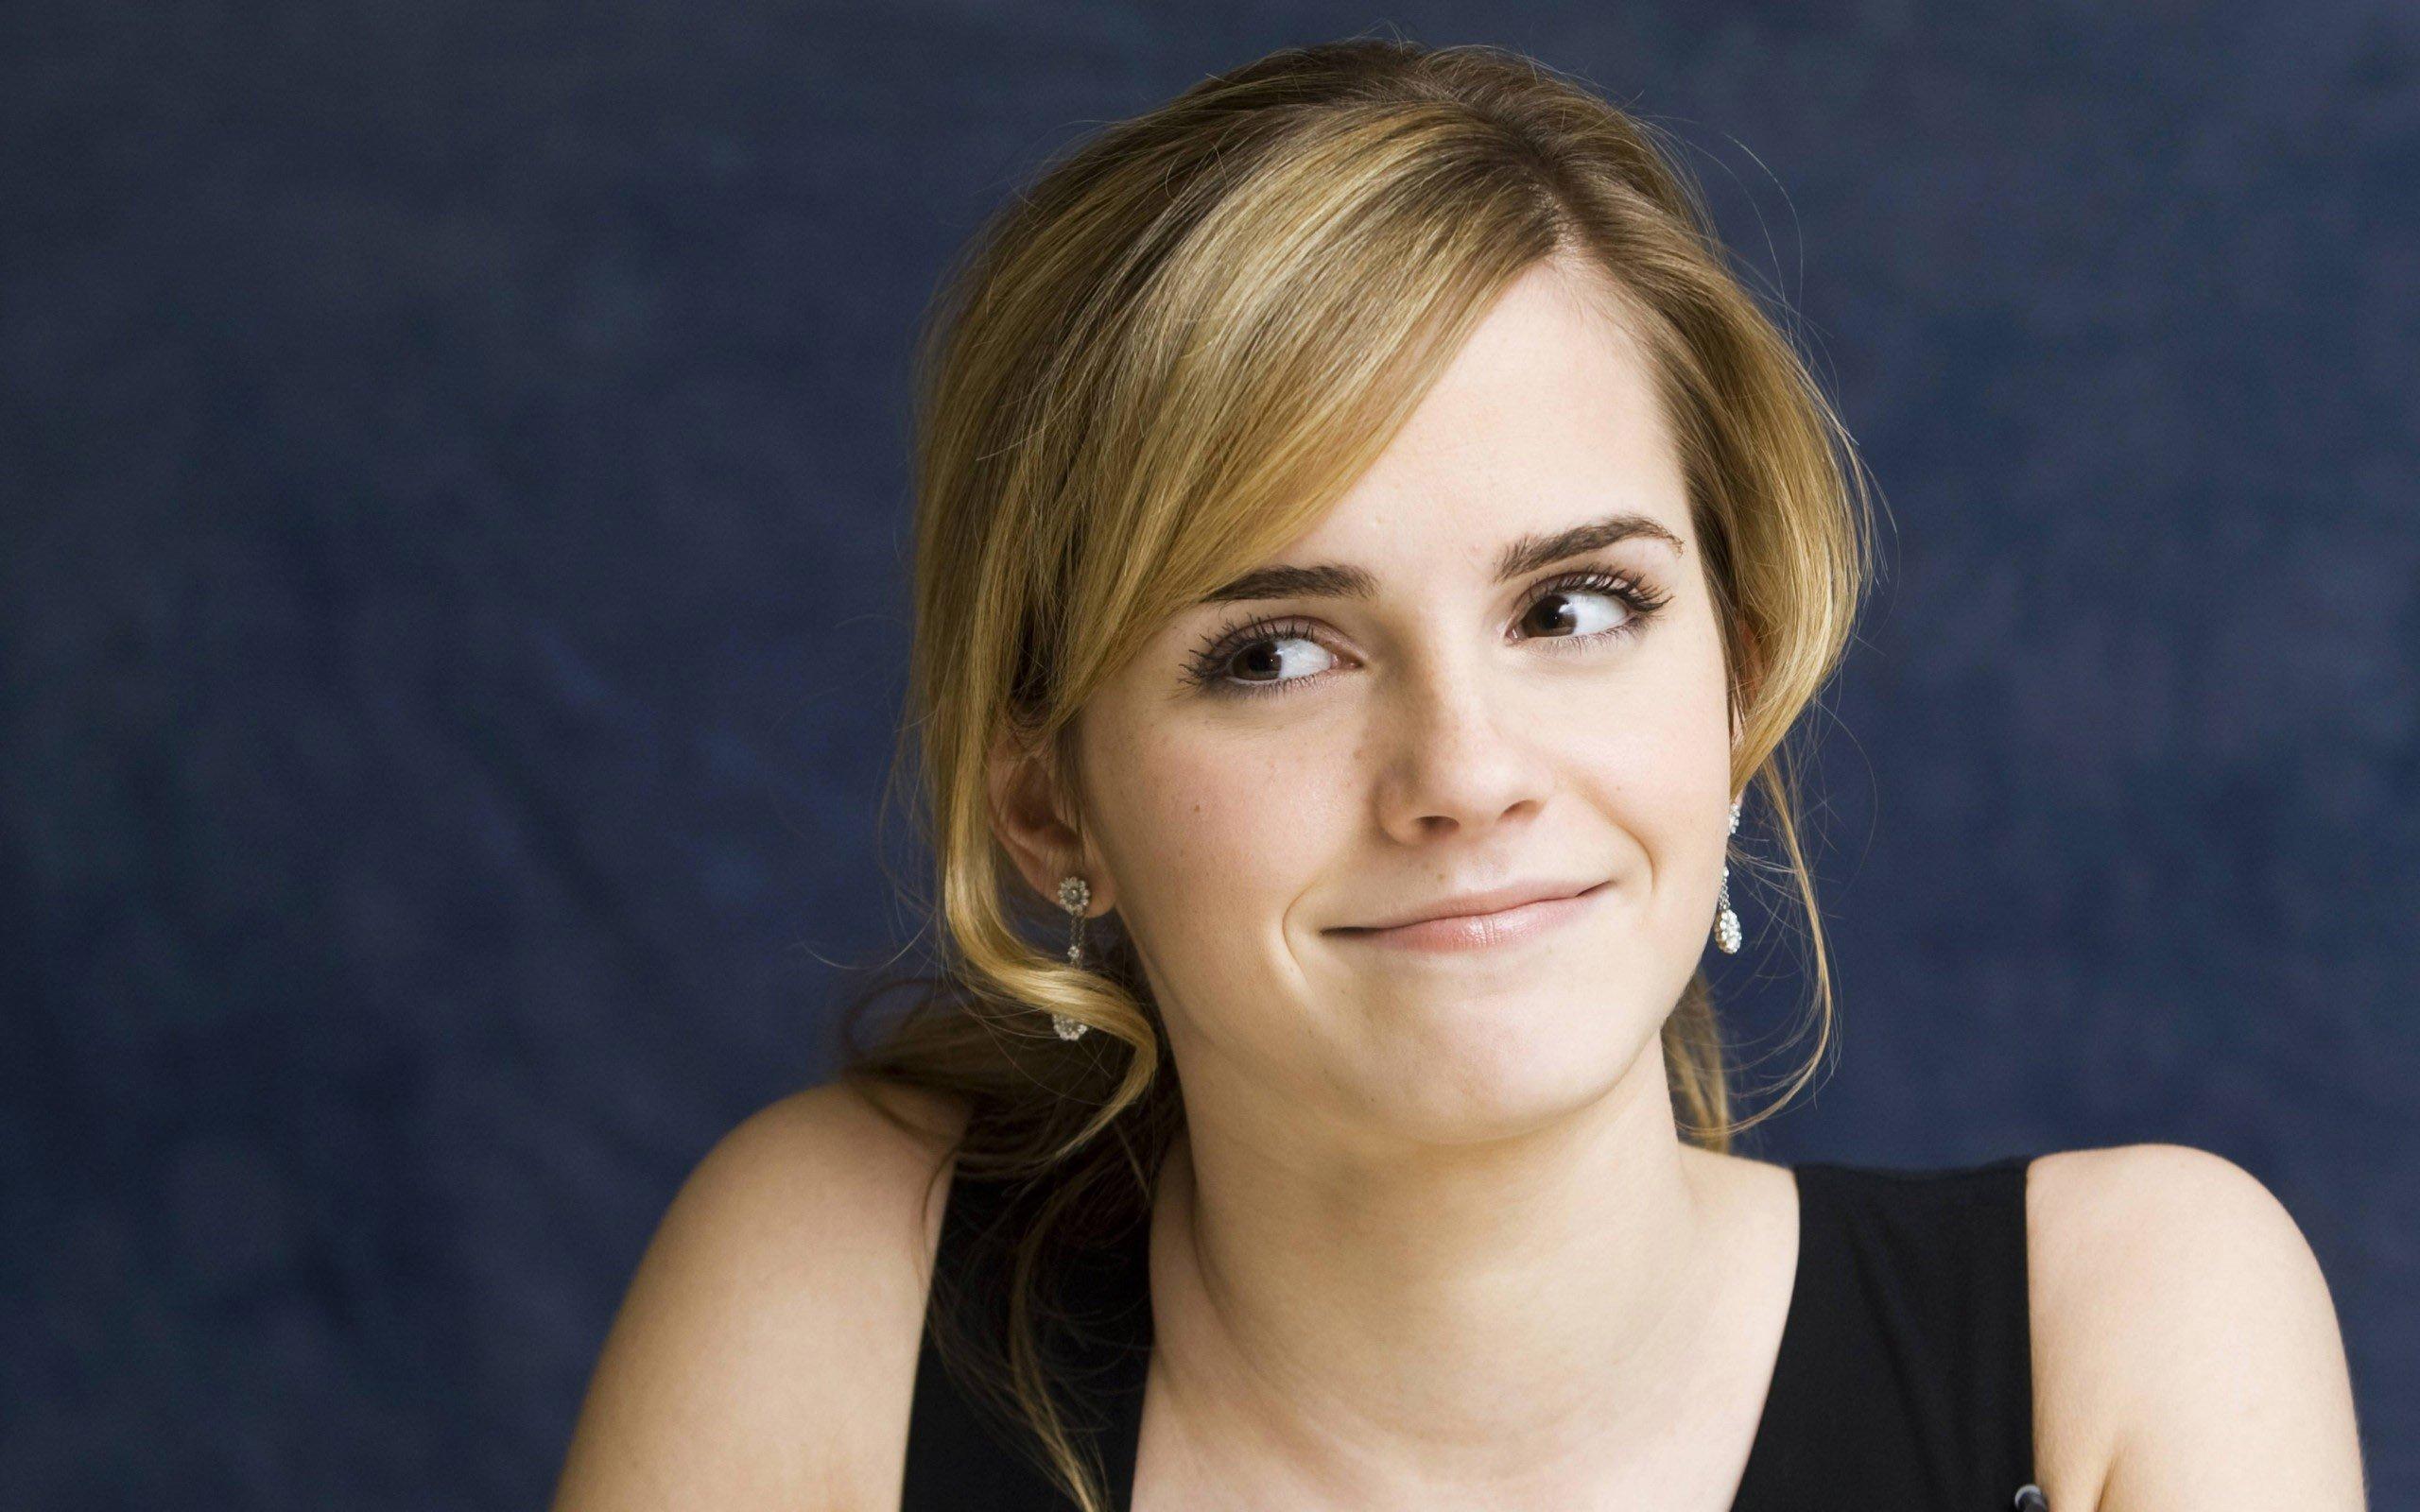 Wallpaper Emma Watson Images